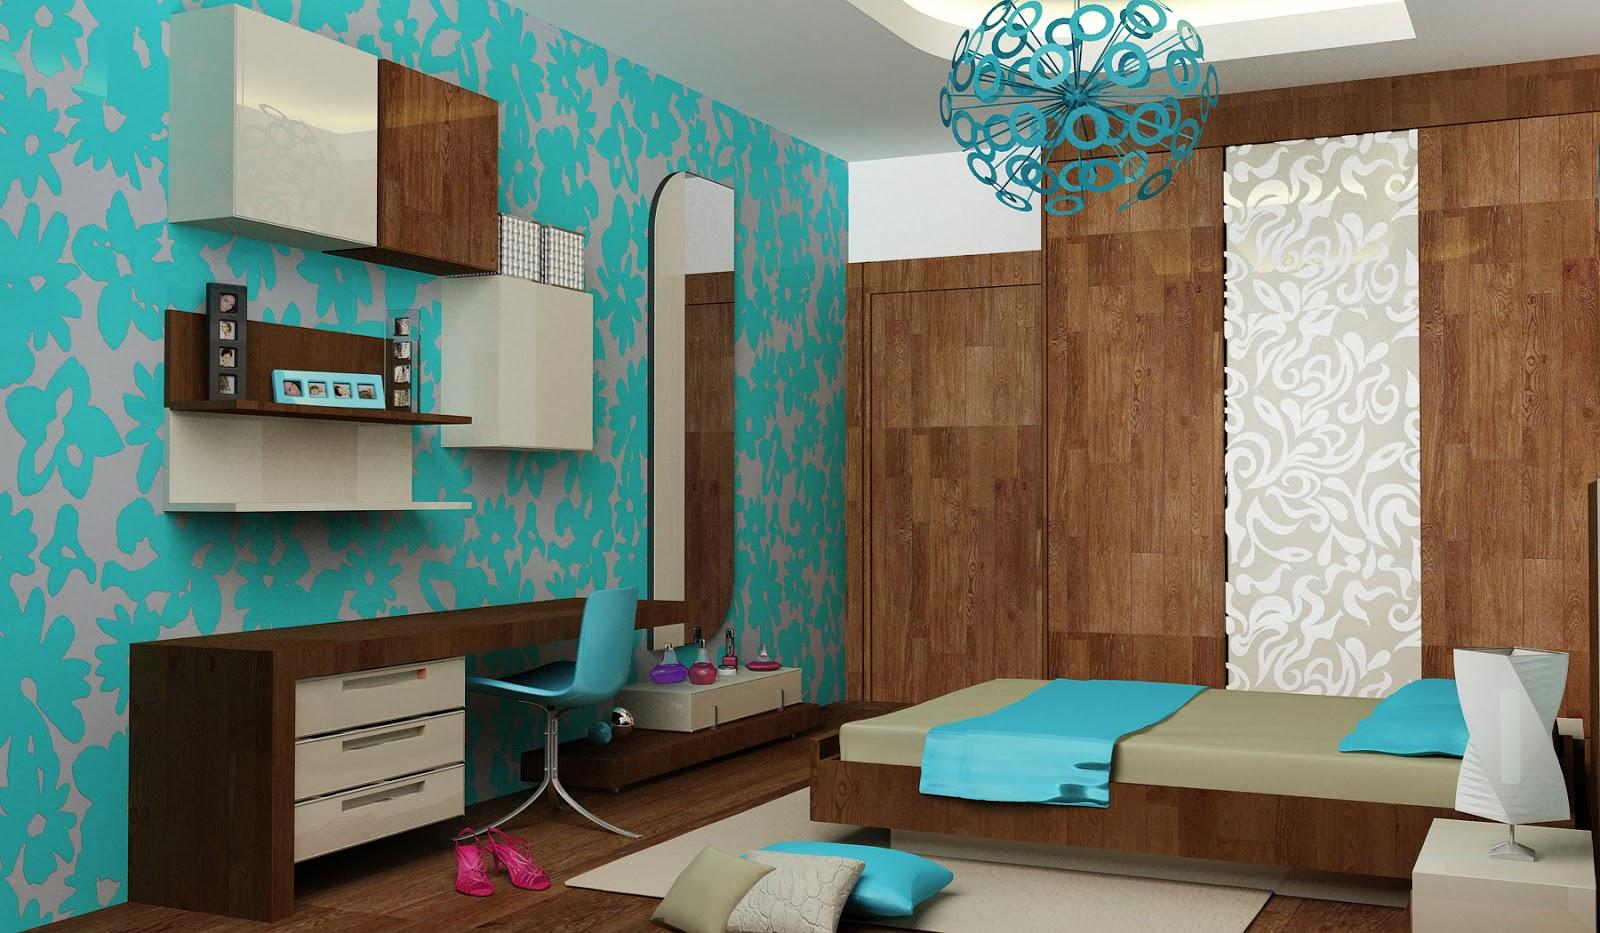 High Definition Modern Apartment Design By HD Interior Design